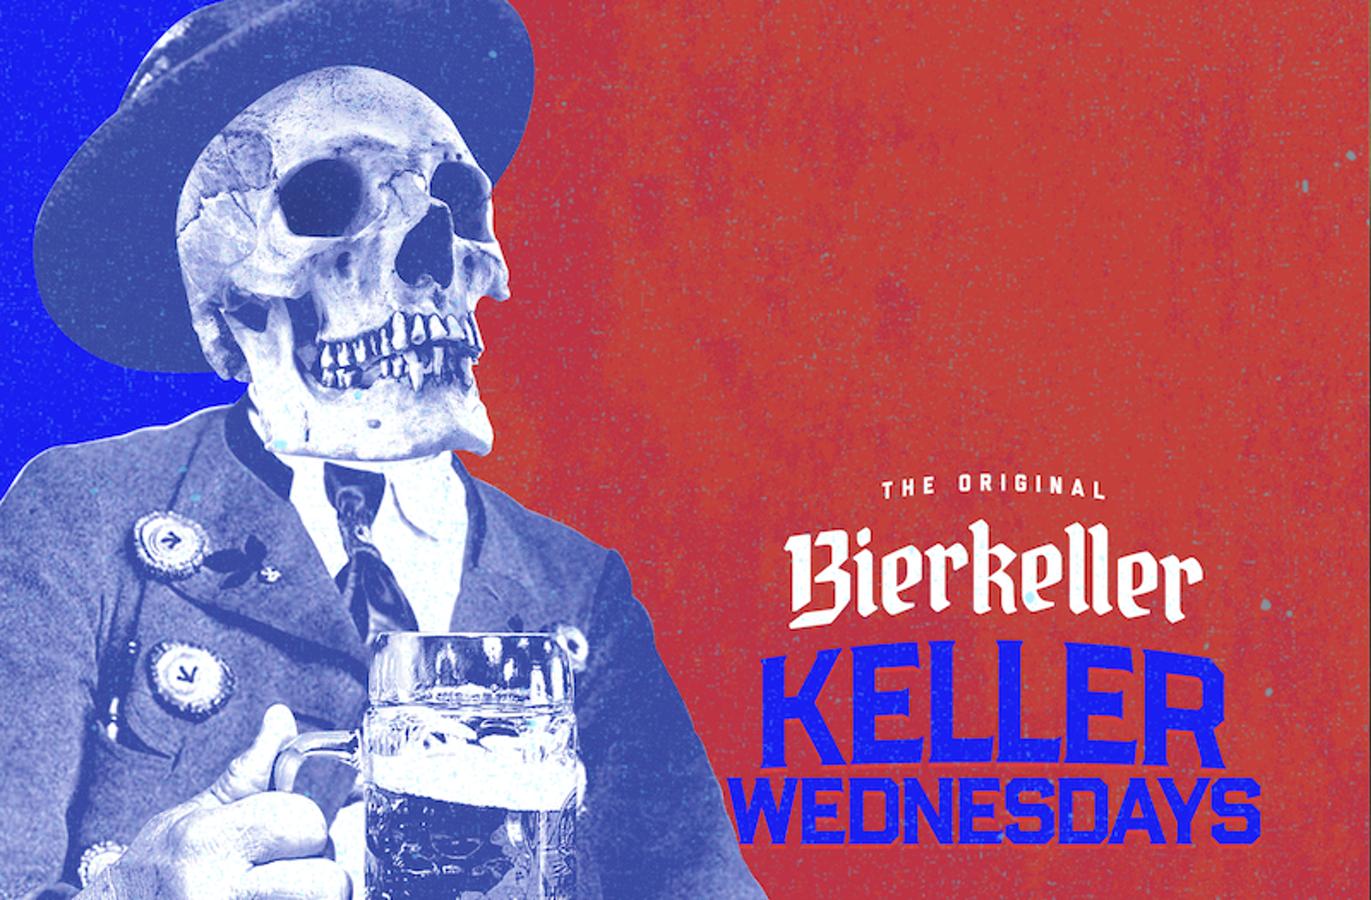 Wednesday – PreKeller